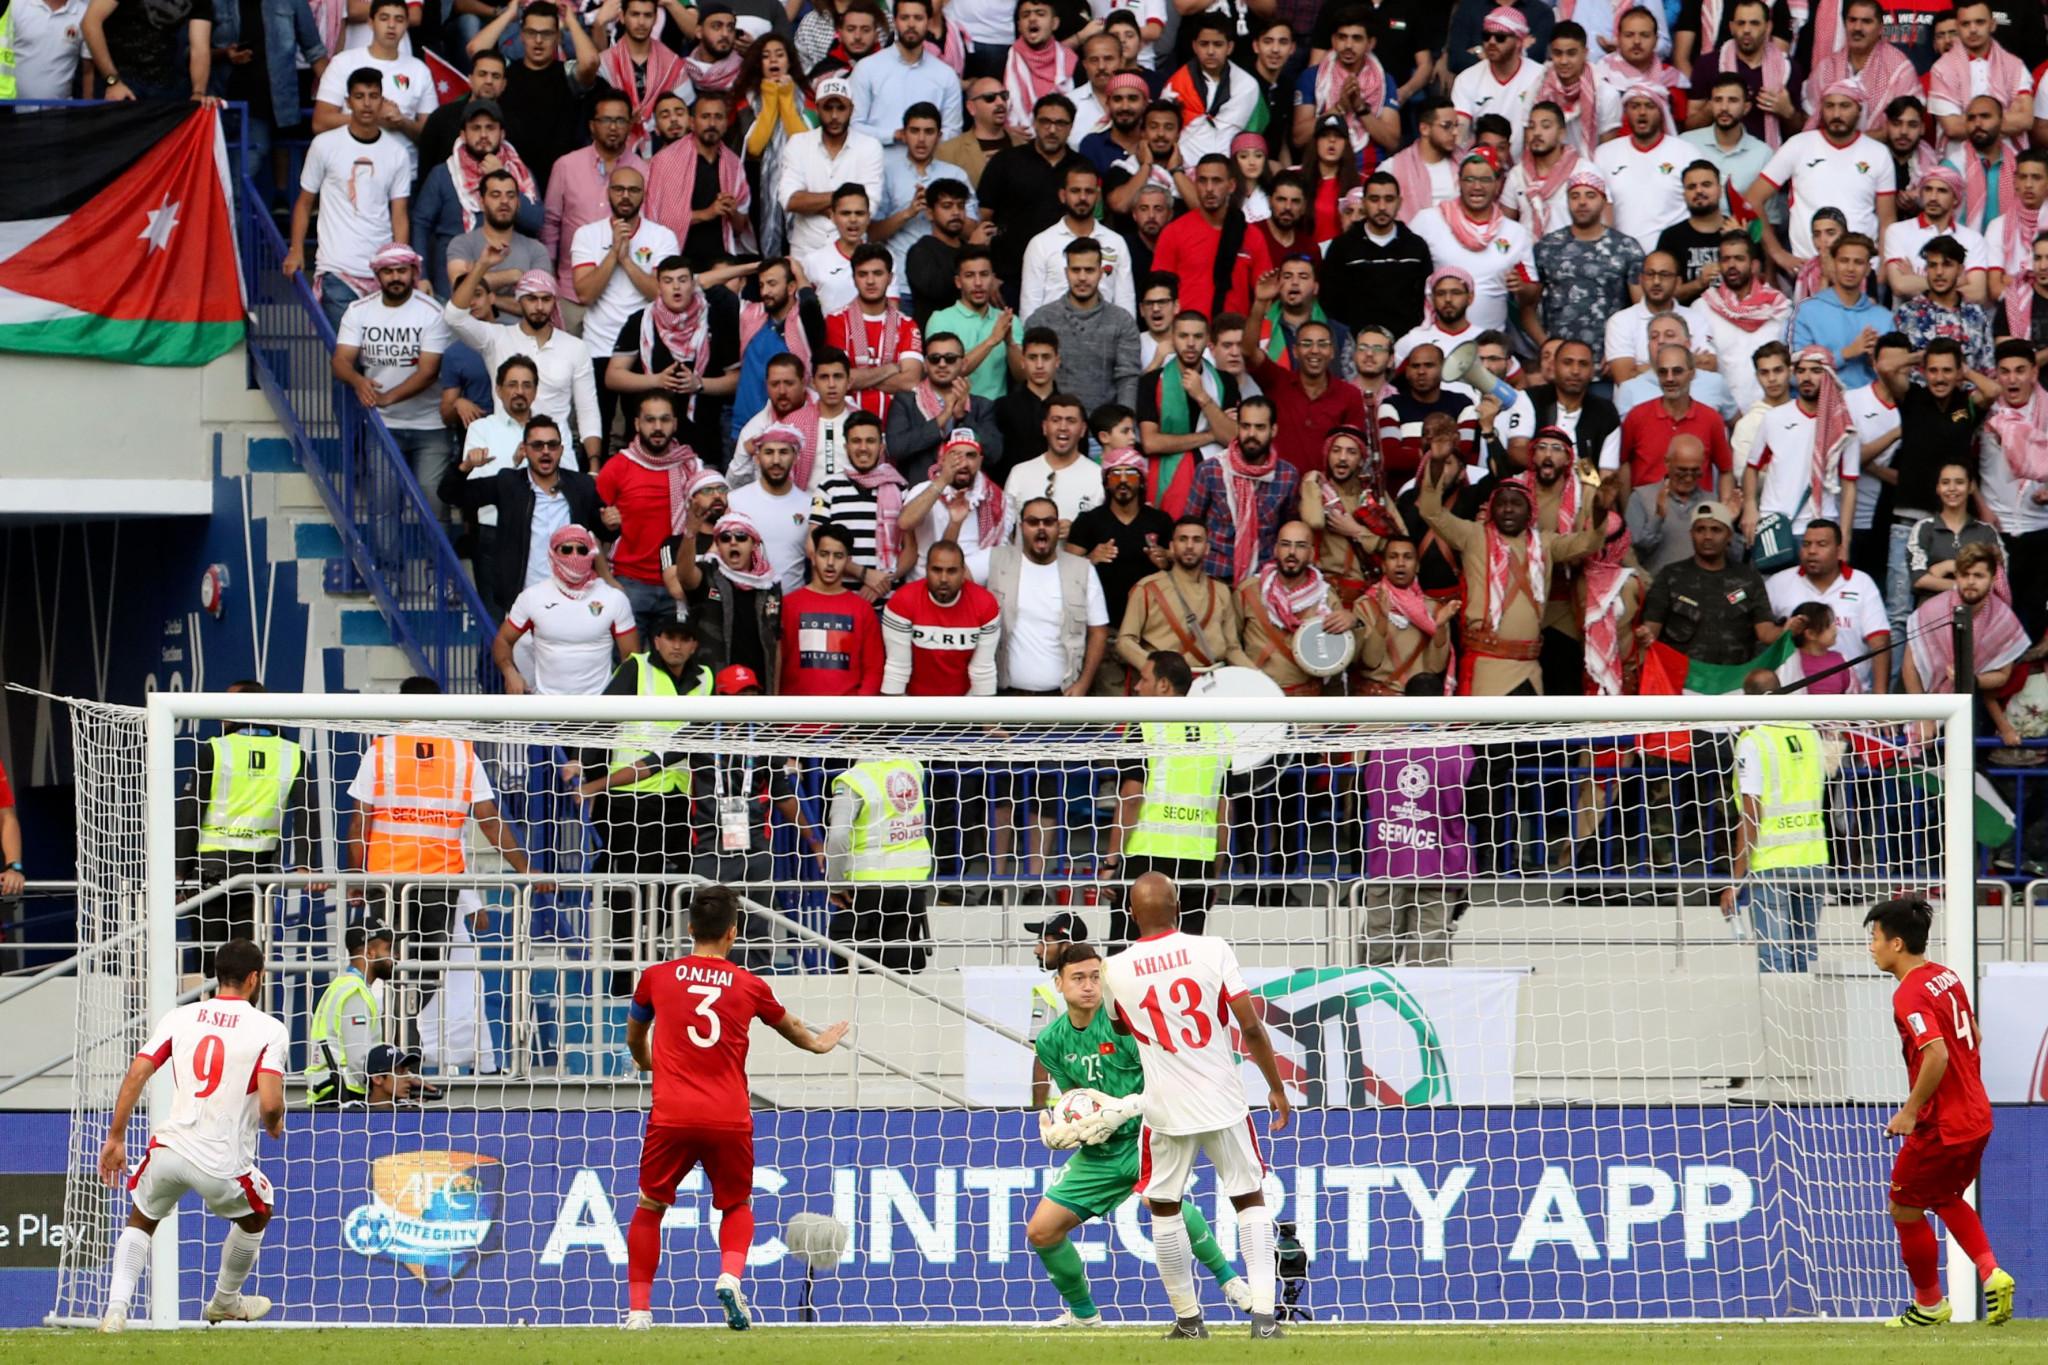 Vietnam beat Jordan on penalties to reach the quarter-finals ©Getty Images